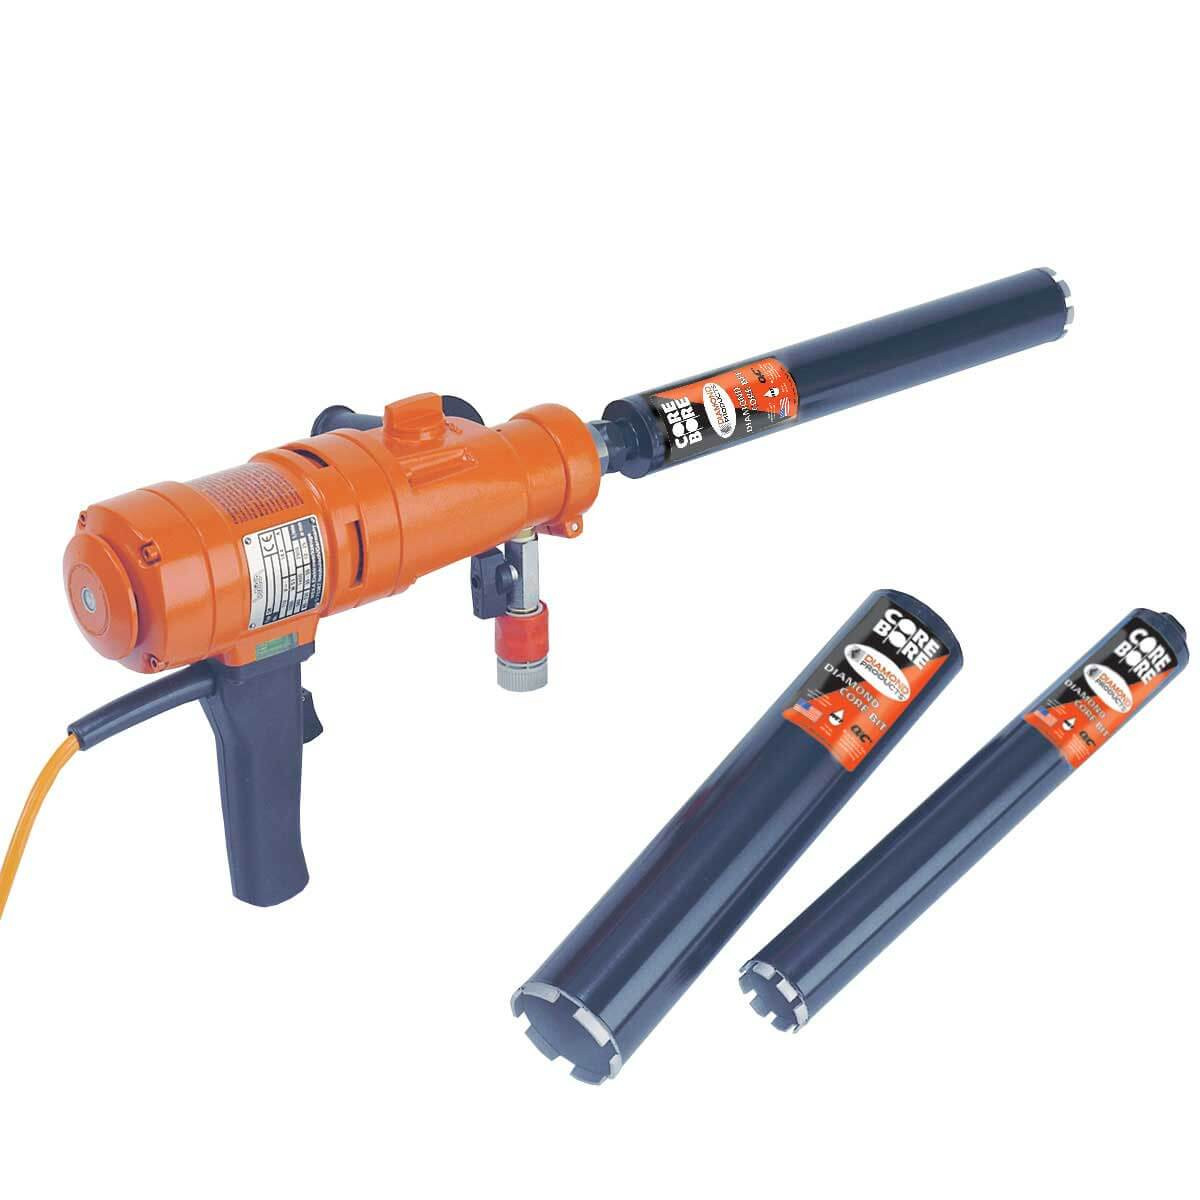 Core Bore Weka DK 12 core drill